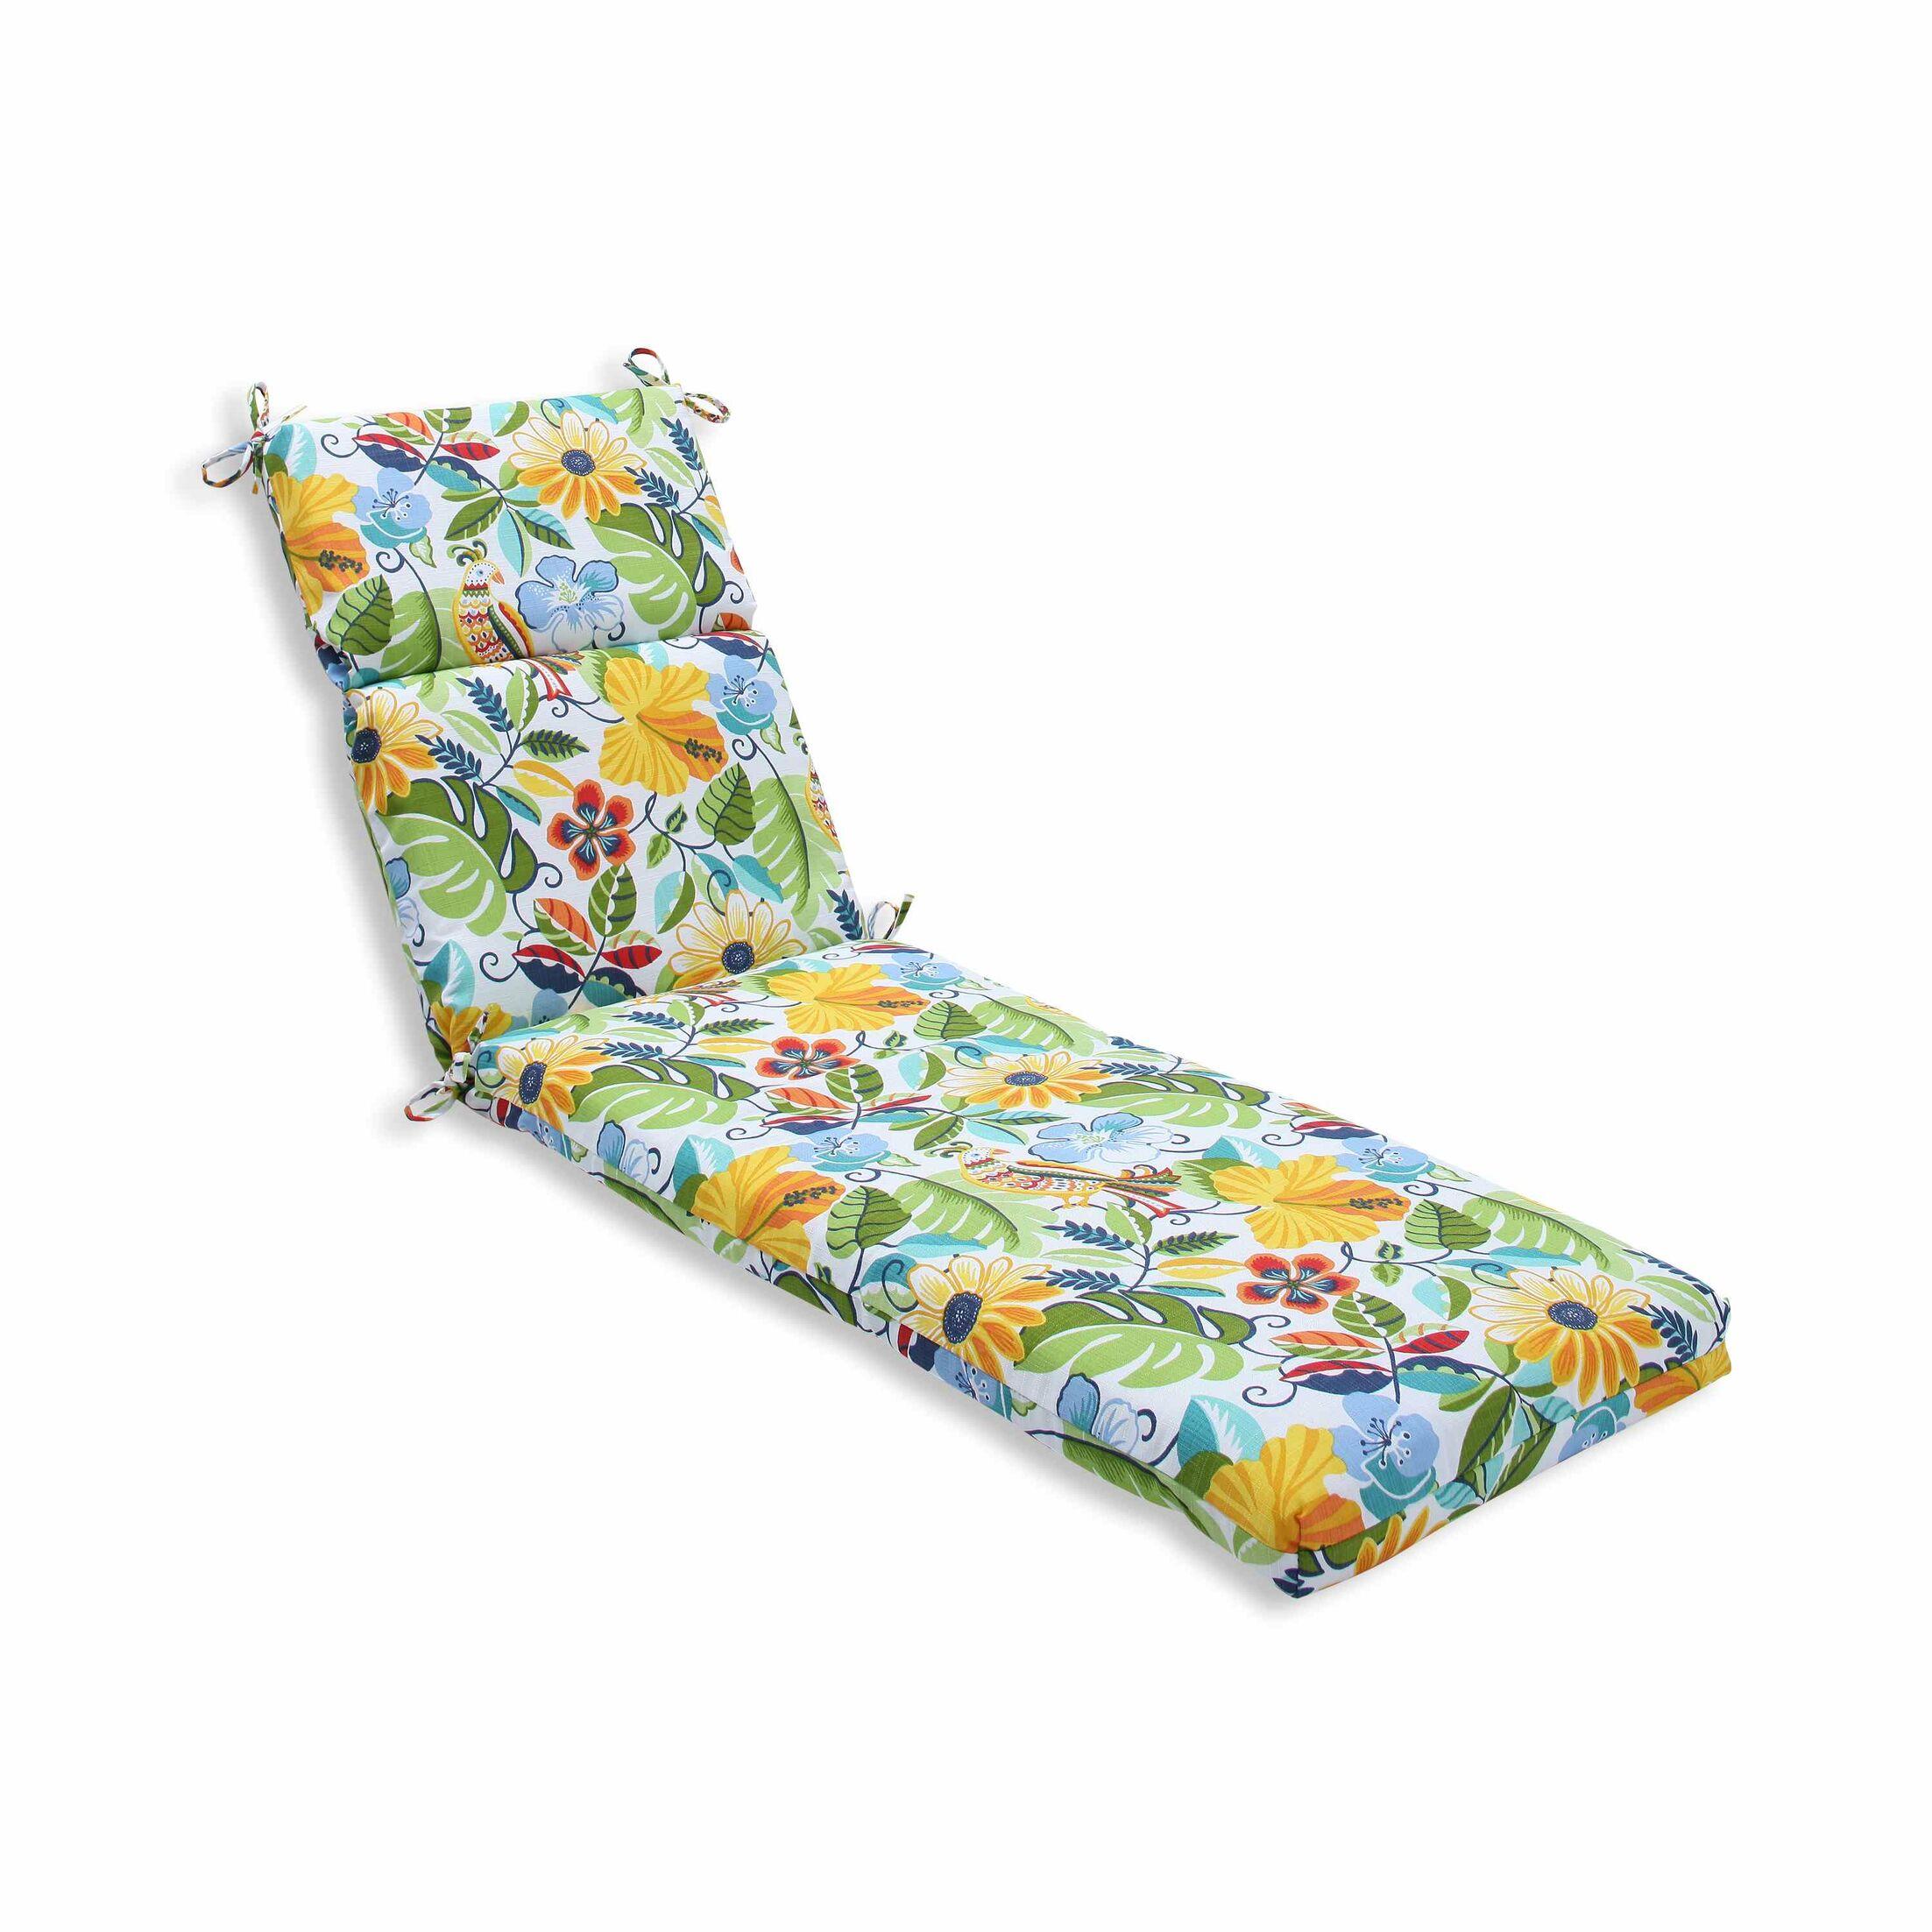 Guadaloue Indoor/Outdoor Chaise Lounge Cushion Color: Garden